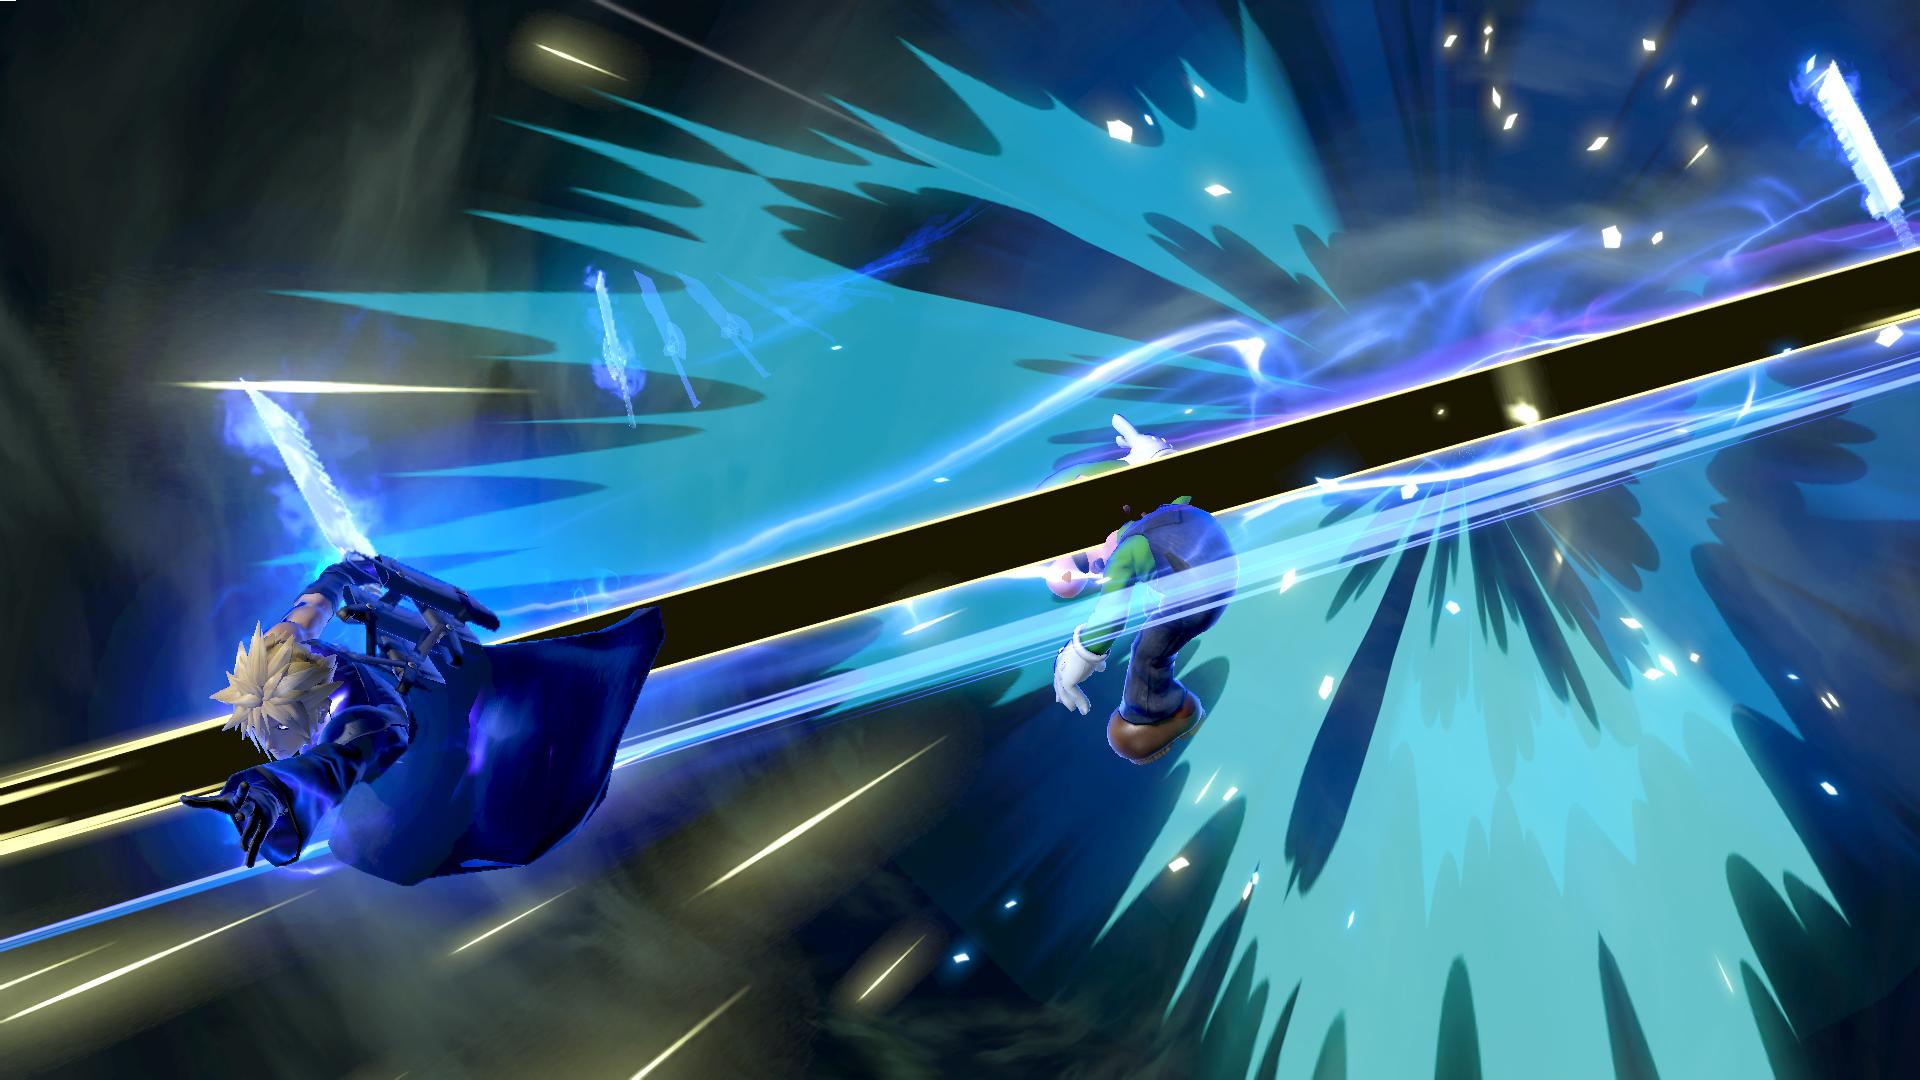 Super-Smash-Bros-Ultimate_2020_12-17-20_002